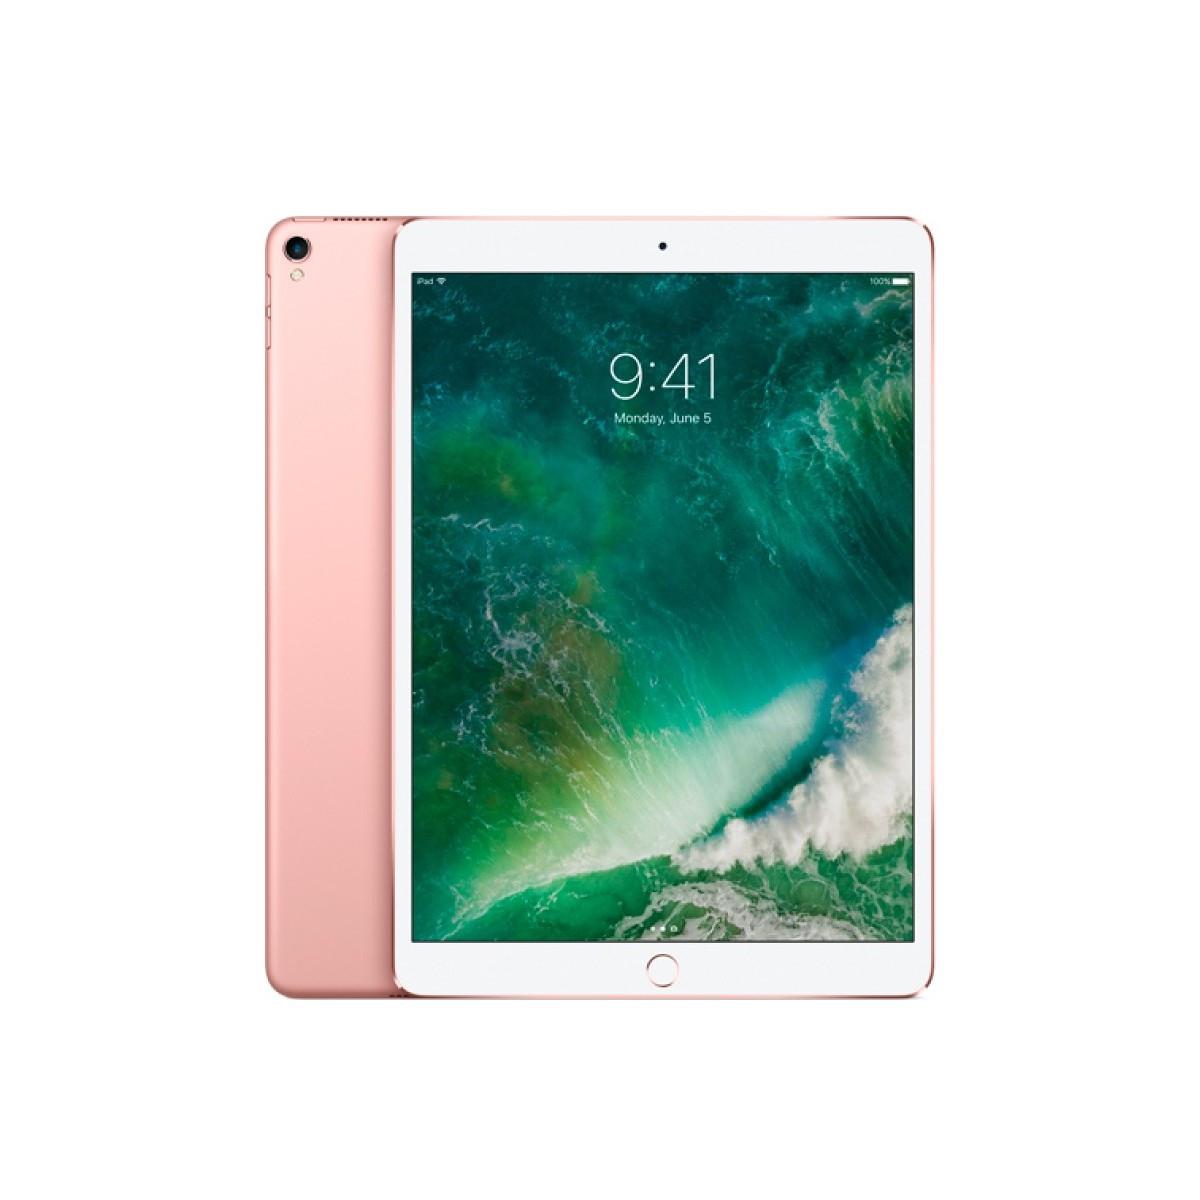 Apple iPad Pro 10.5 64Gb Wi-Fi Rose Gold (MQDY2RK) 2017